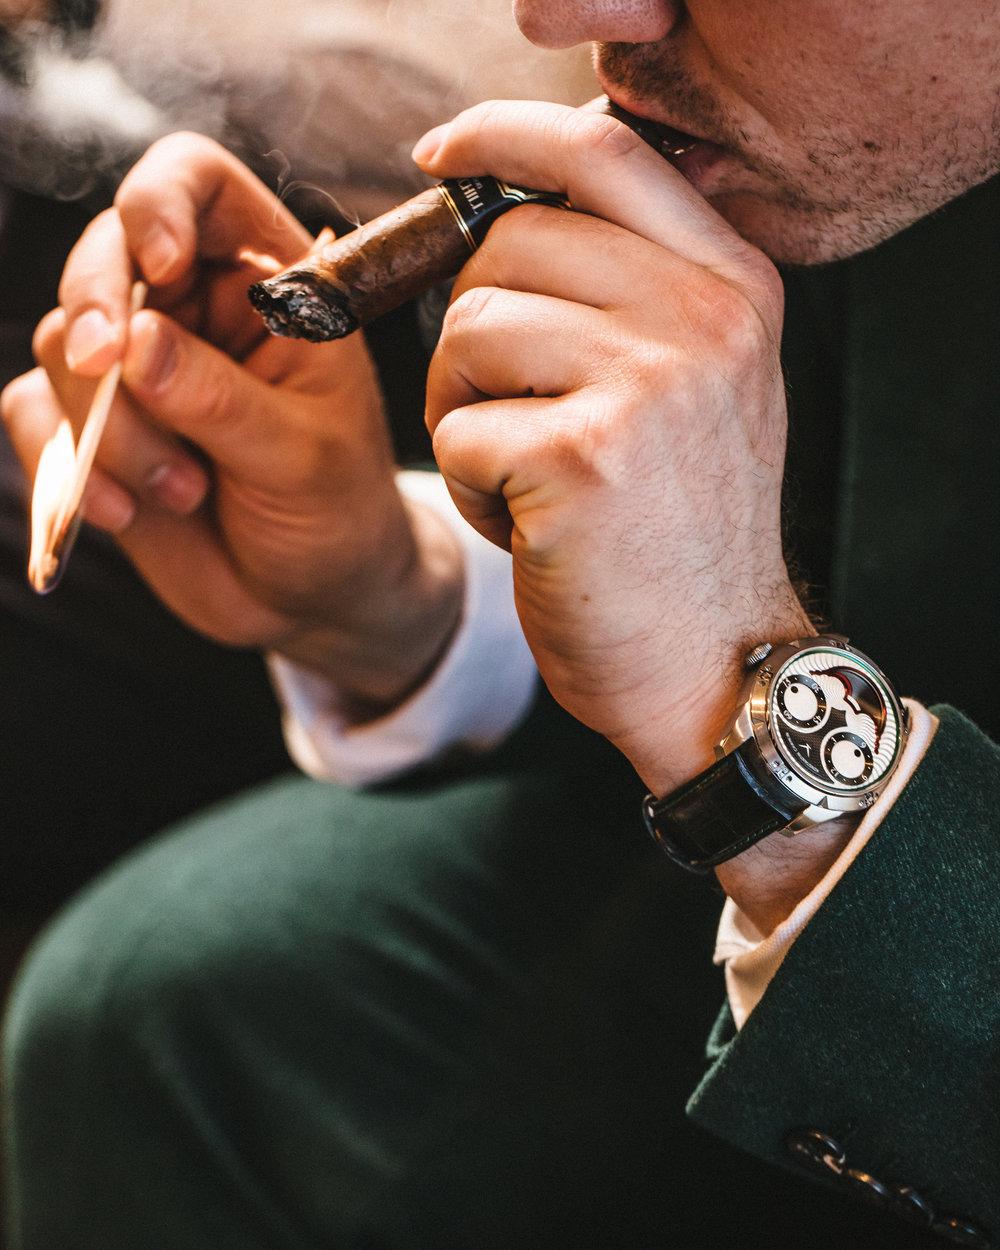 The Konstantin Chaykin Joker piece unique on the wrist of Swisswatchgang